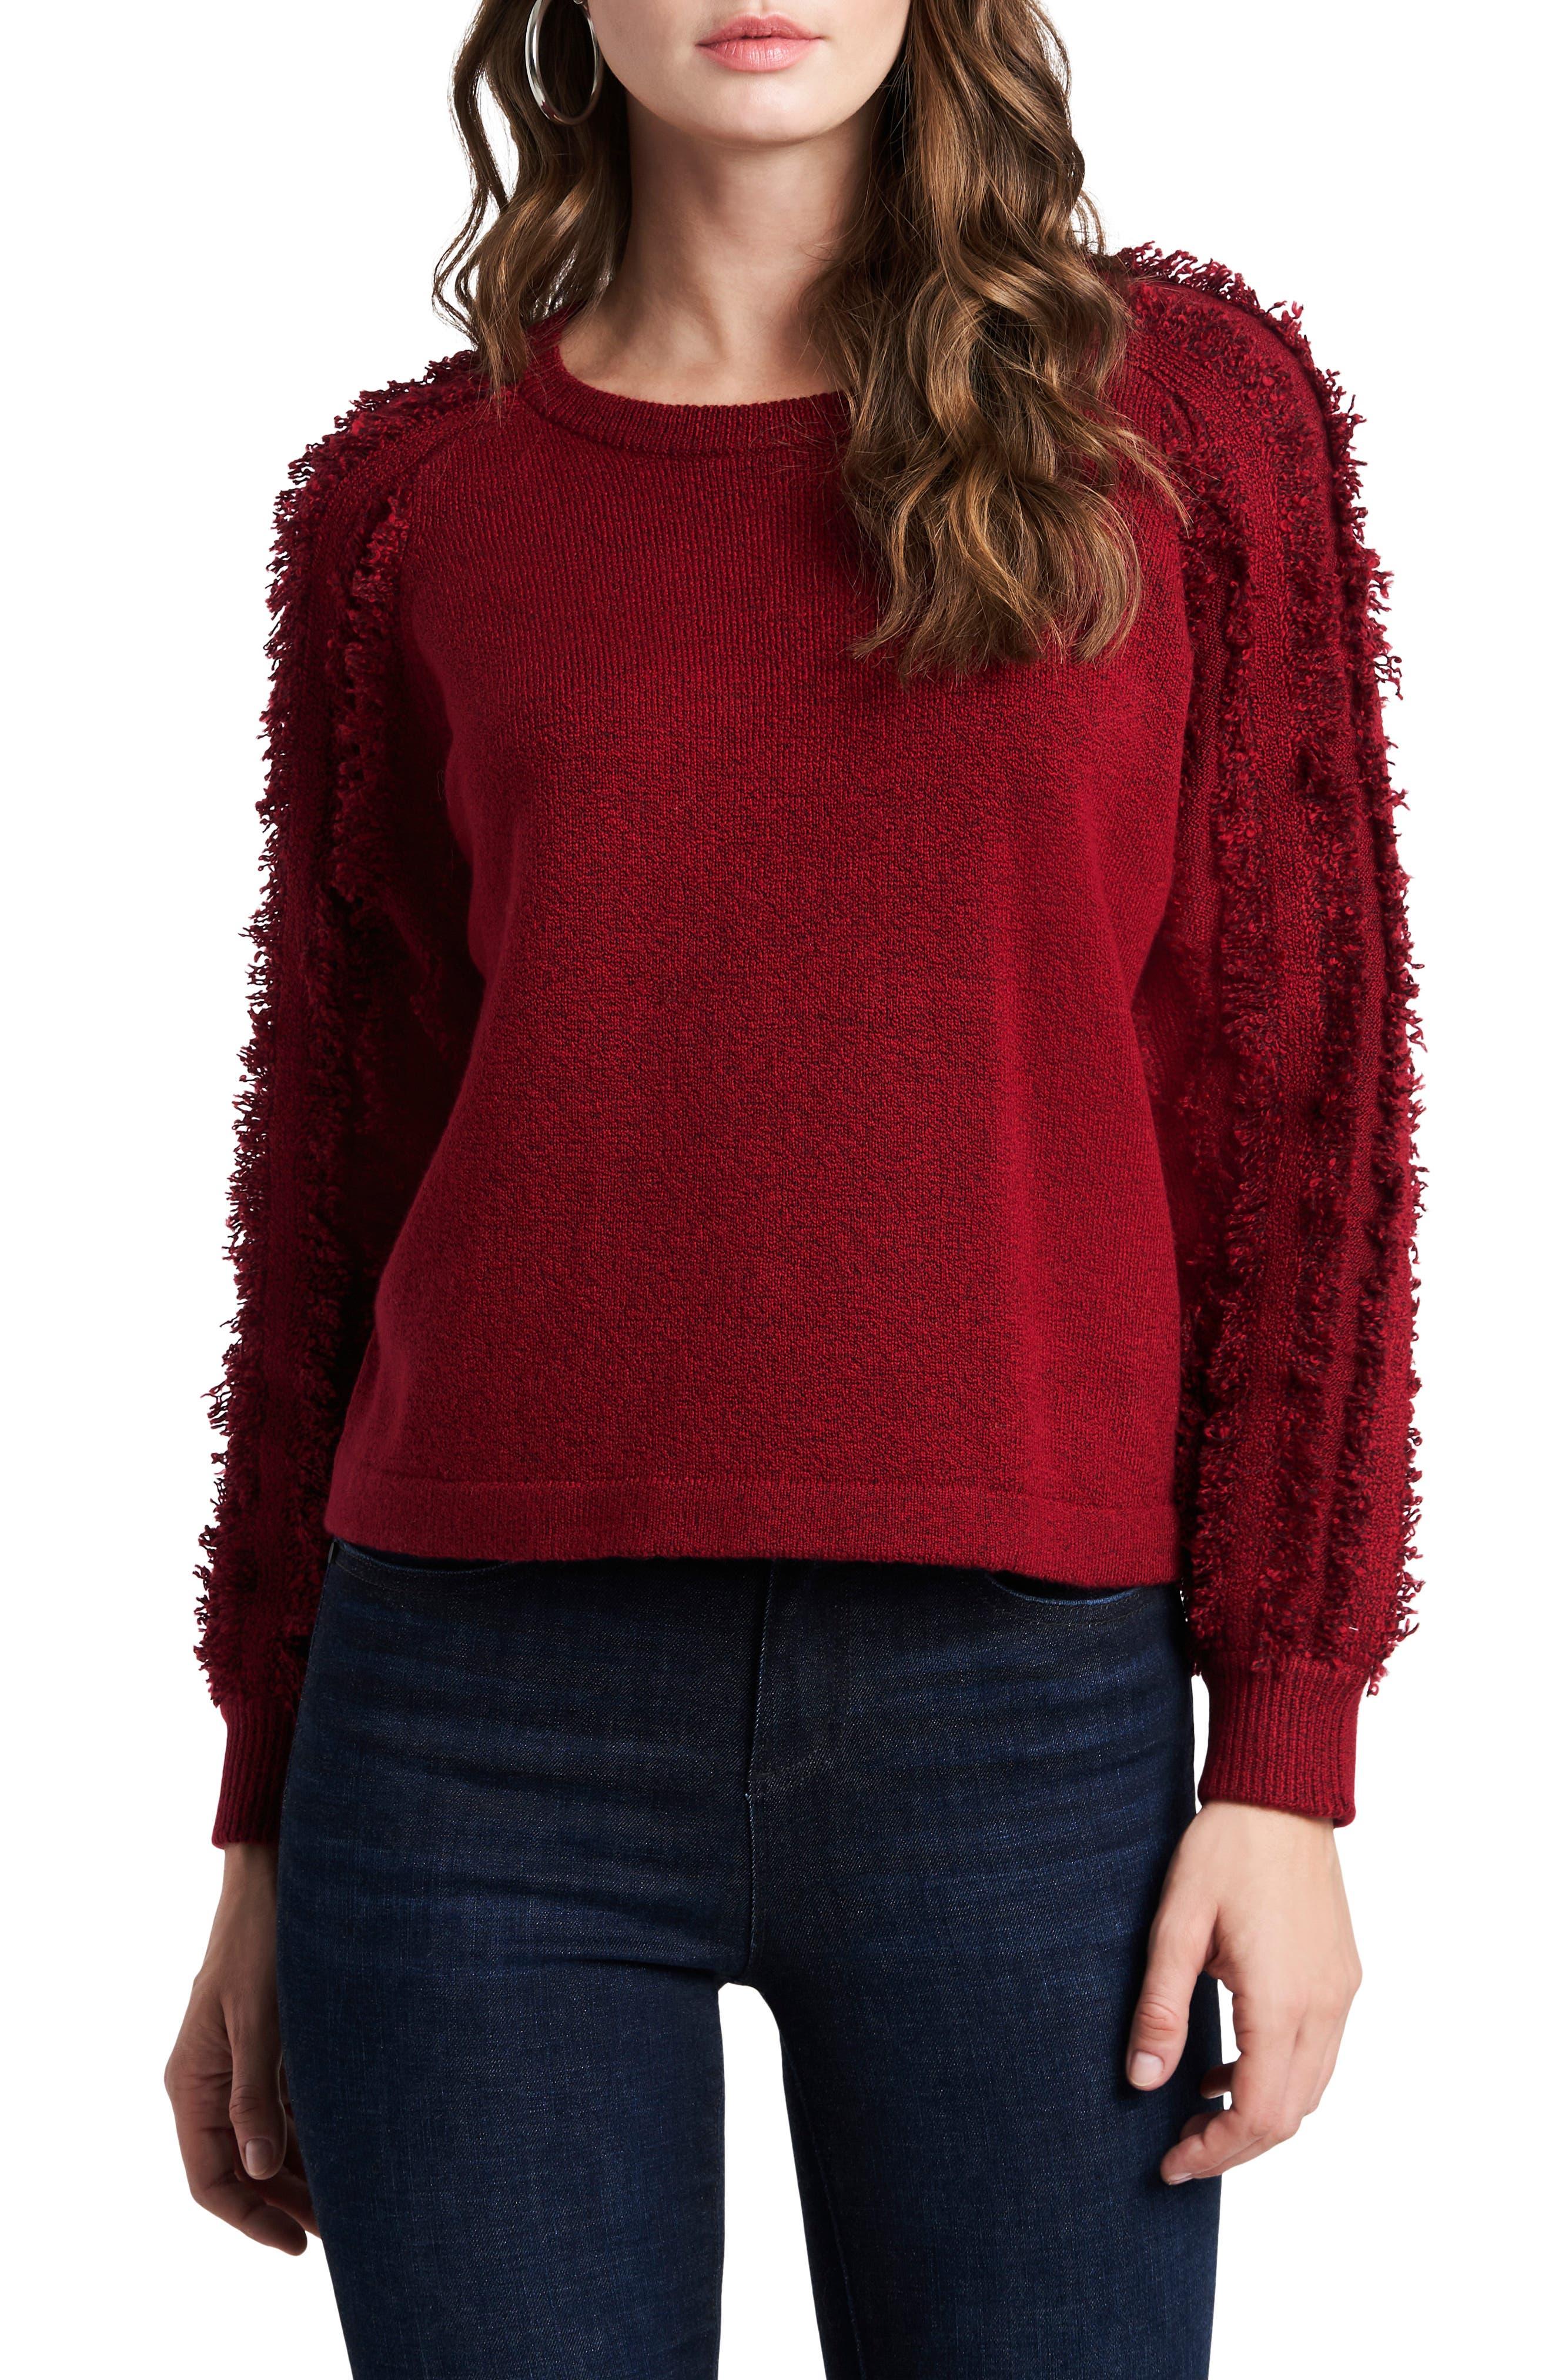 Madewell XXL Top Long Sleeve Puff-Sleeve Knit Scoop Neck Cumin Soft Ribbed Cuff